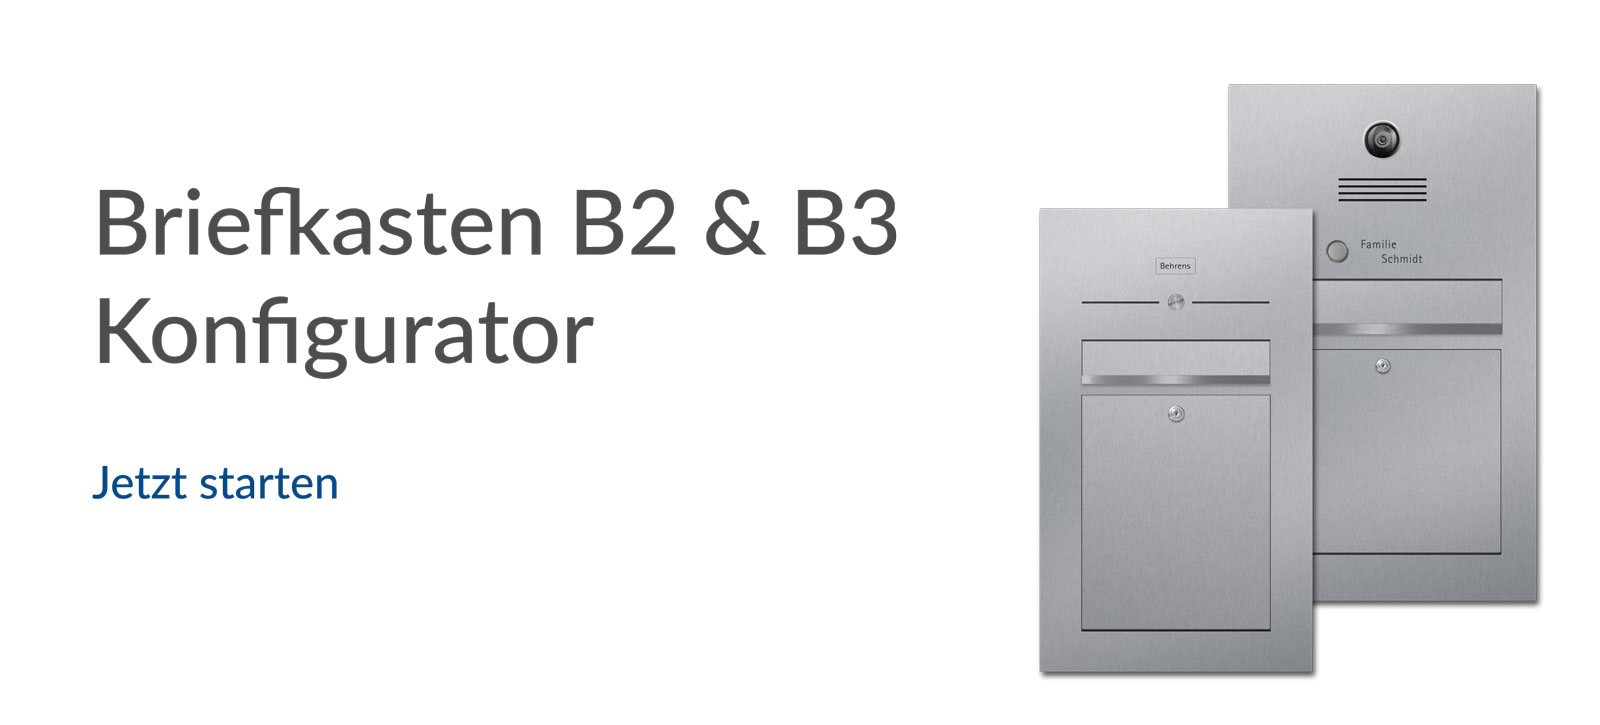 letterbox stainless steel Konfigurator Banner